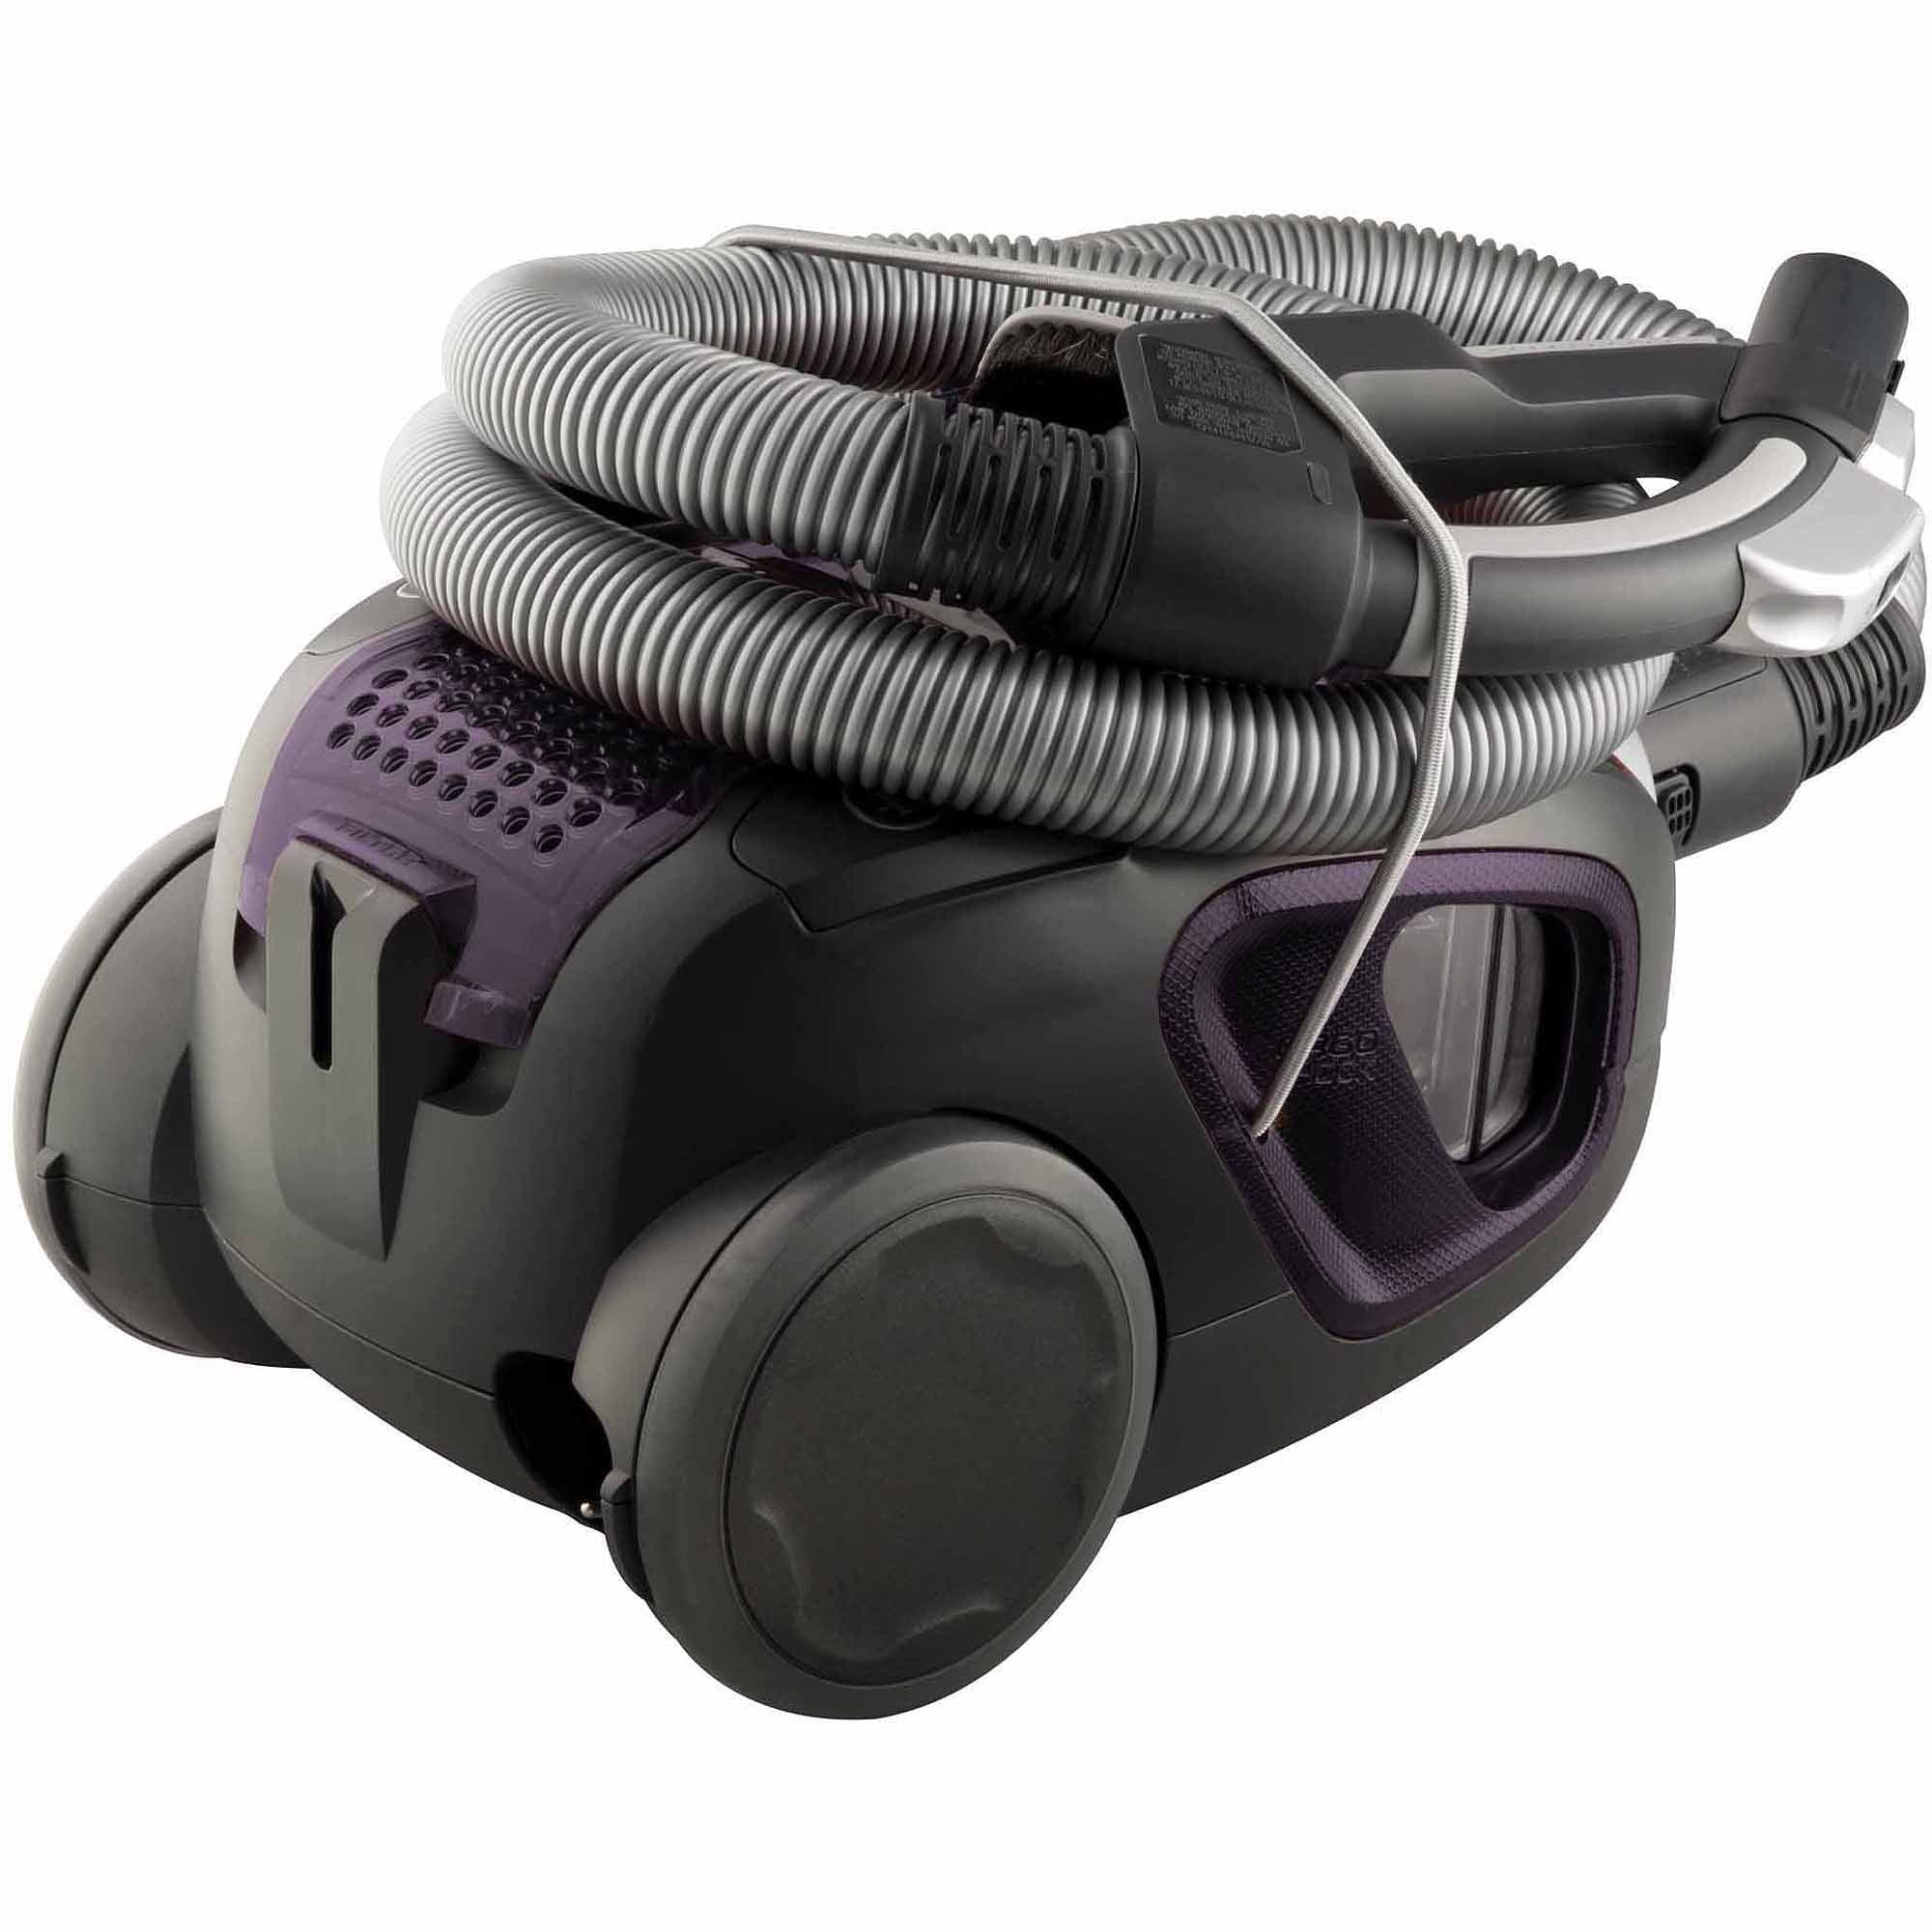 electrolux ultraactive deepclean bagless canister vacuum el4305az walmartcom - Electrolux Canister Vacuum